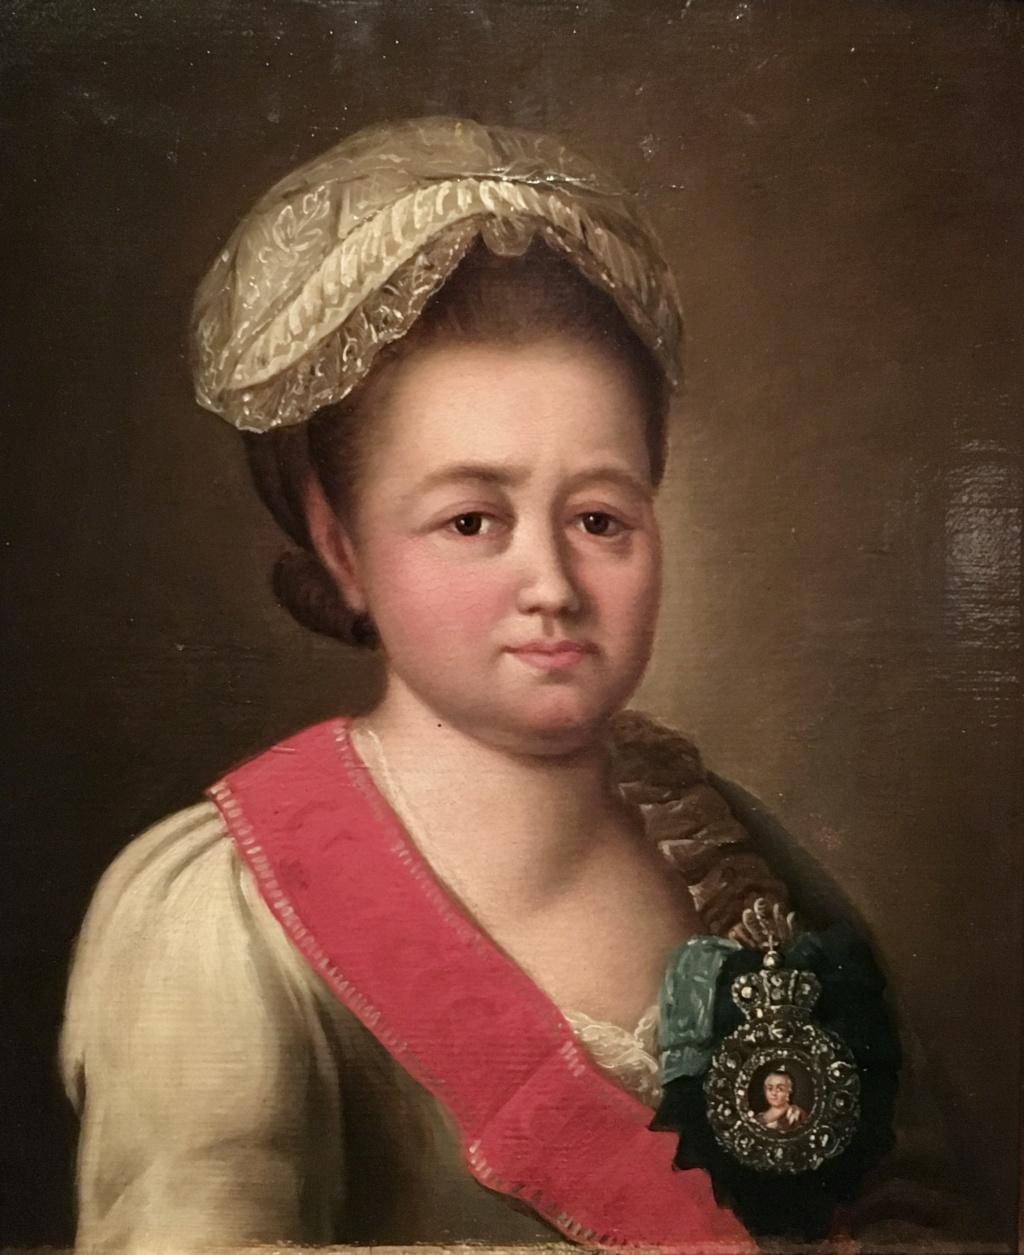 La princesse Daschkoff (Dachkov), dame d'honneur de Catherine II 355dcc10